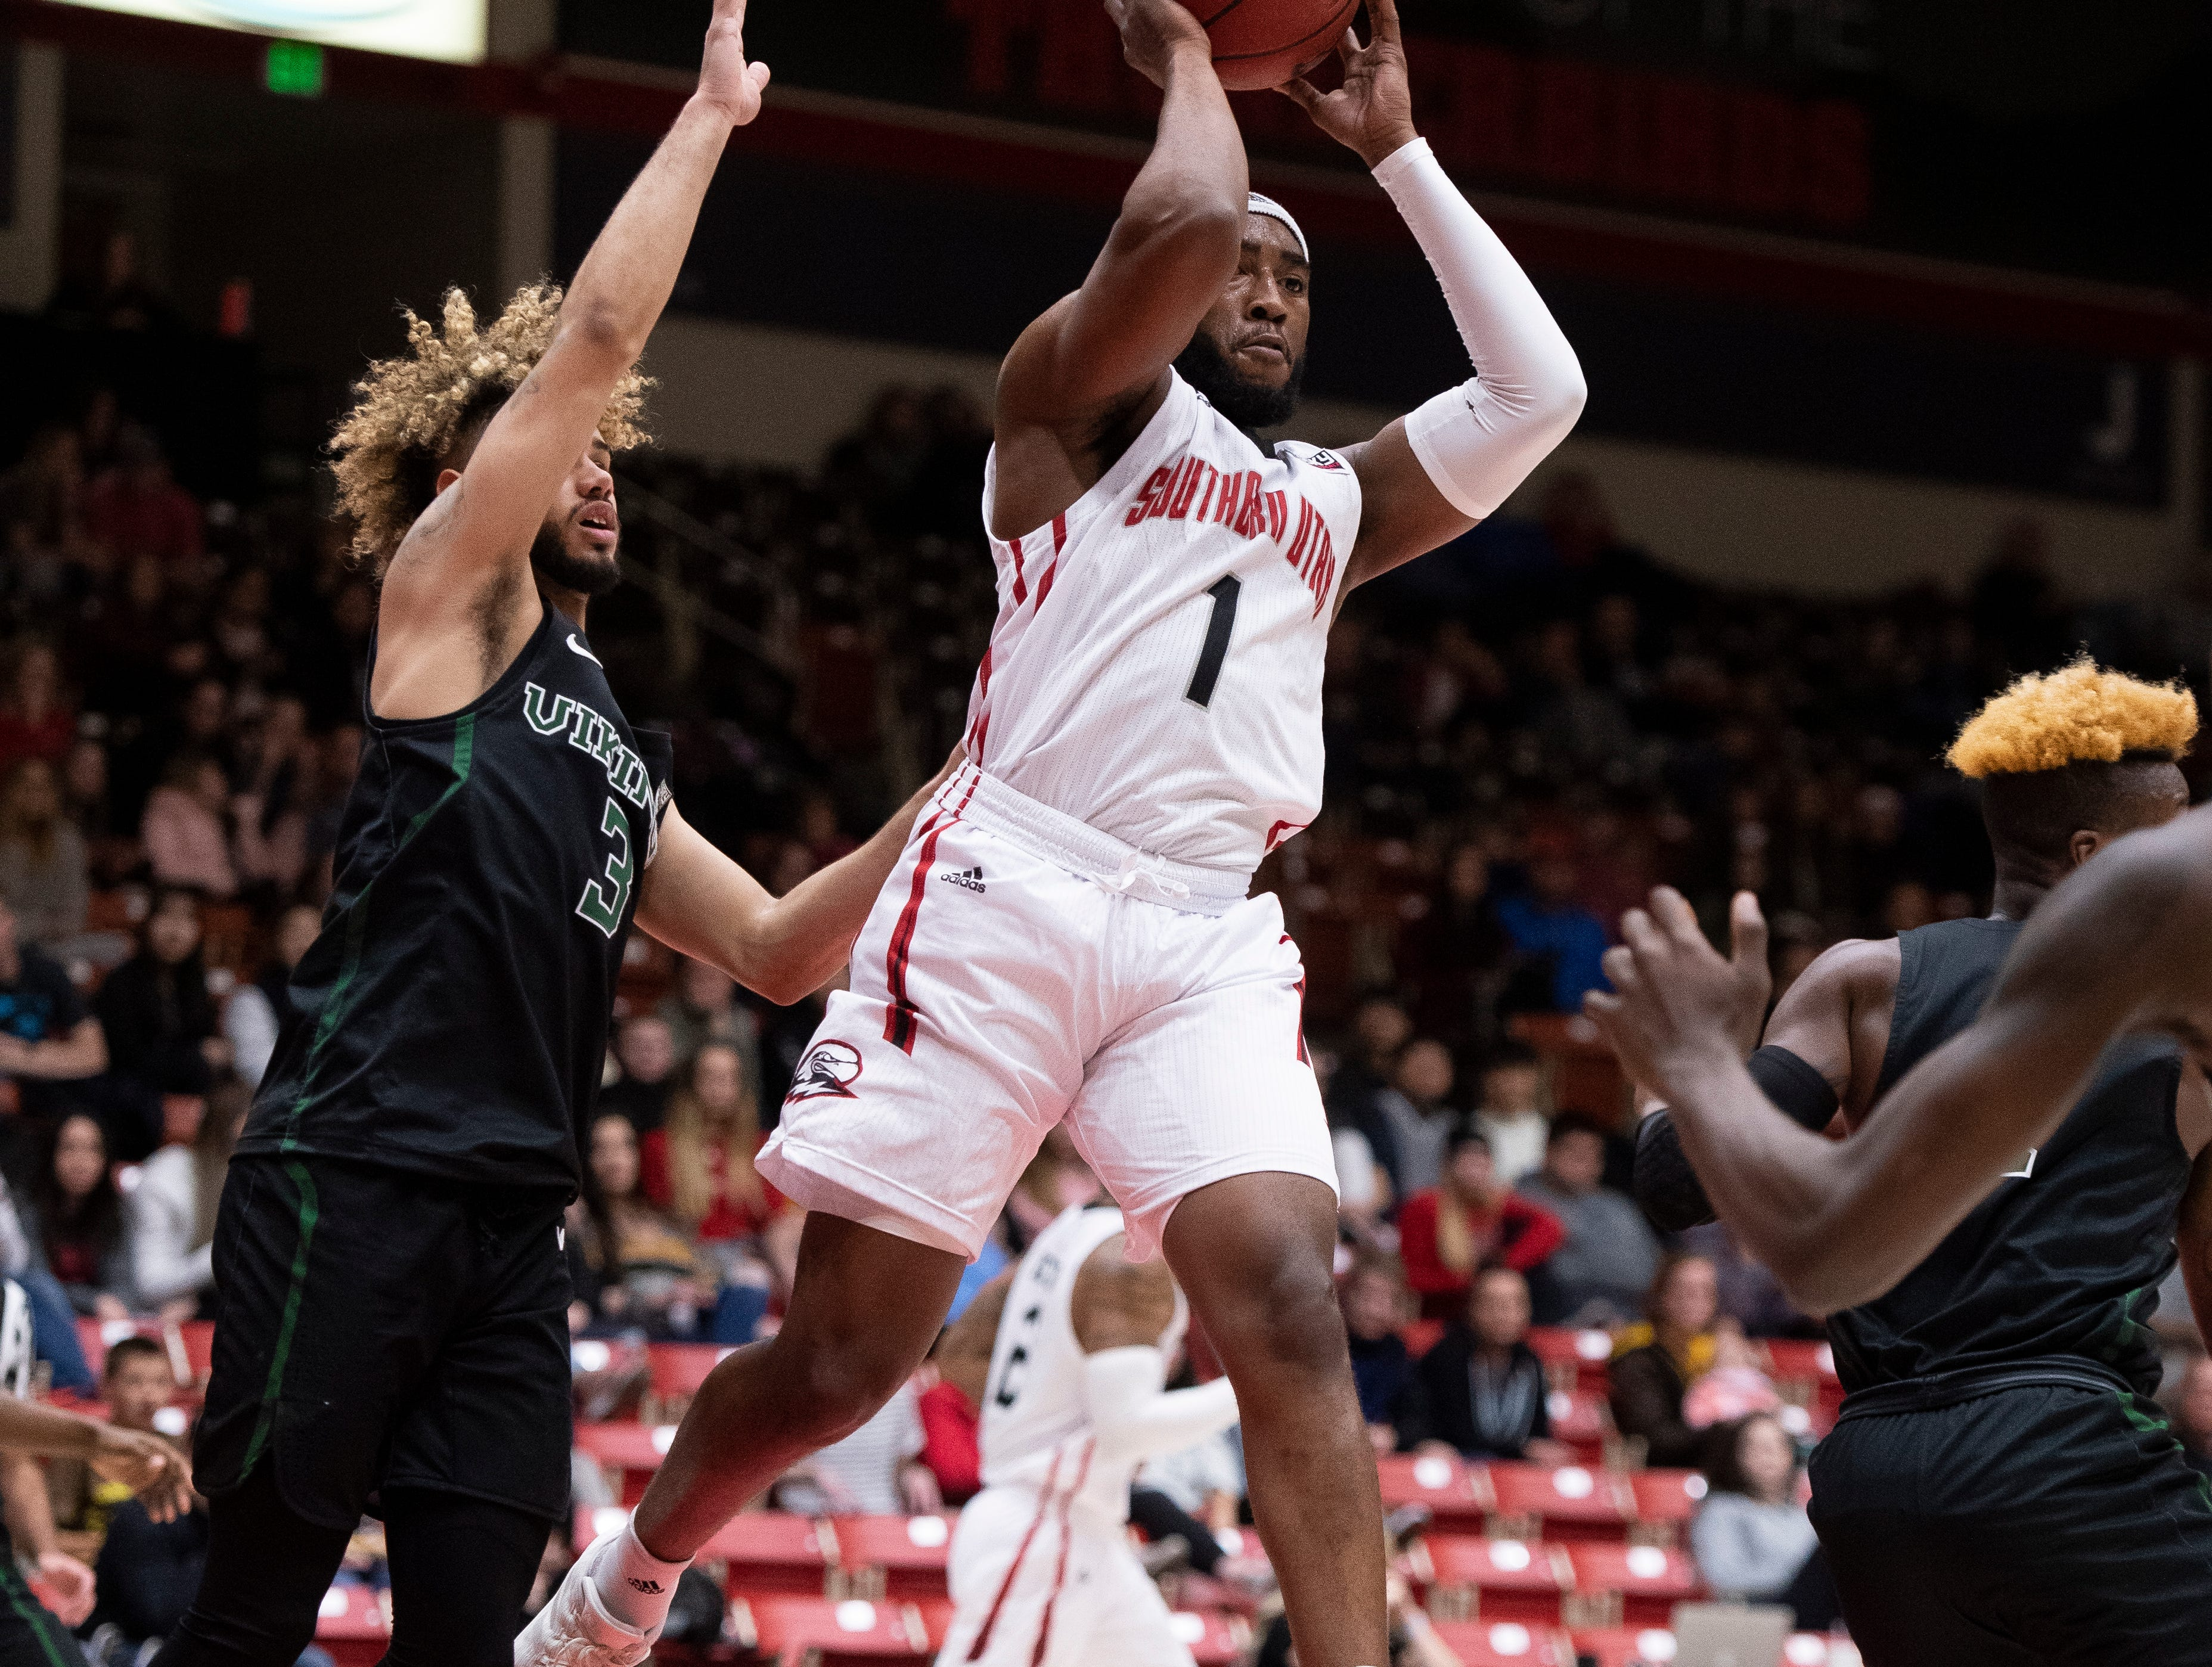 Southern Utah University freshman Kenton Eskridge (1) throws a flying pass against Portland State in the America First Event Center Thursday, January 17, 2019. SUU won, 83-69.